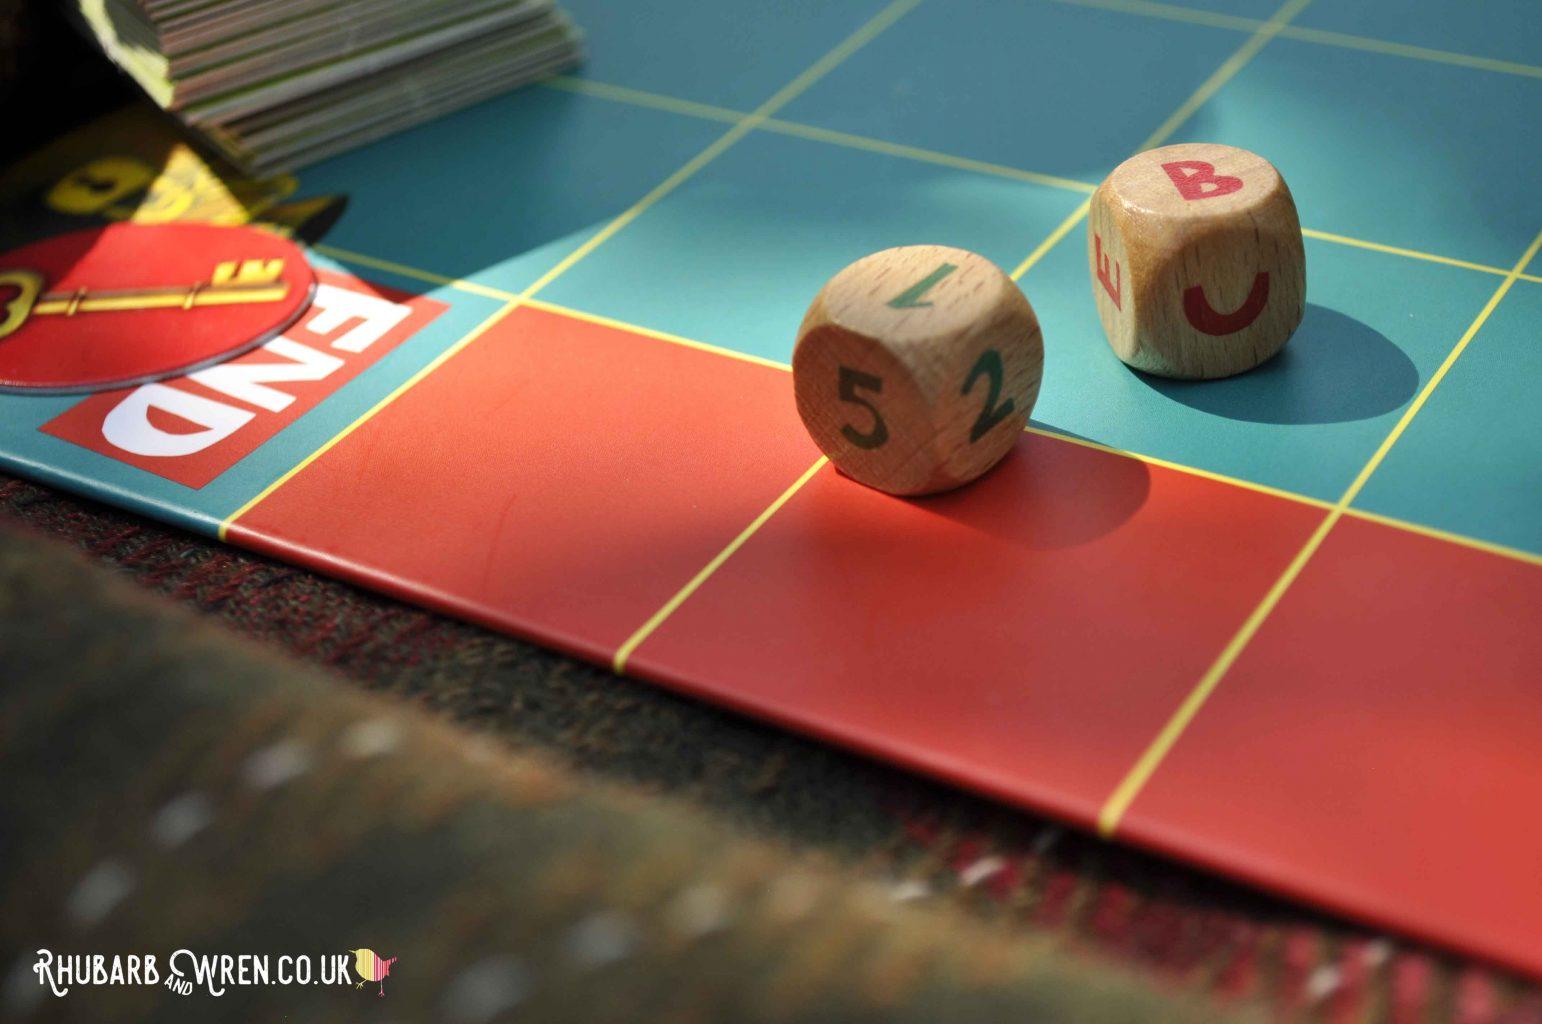 Peaceable Kingdom board game dice